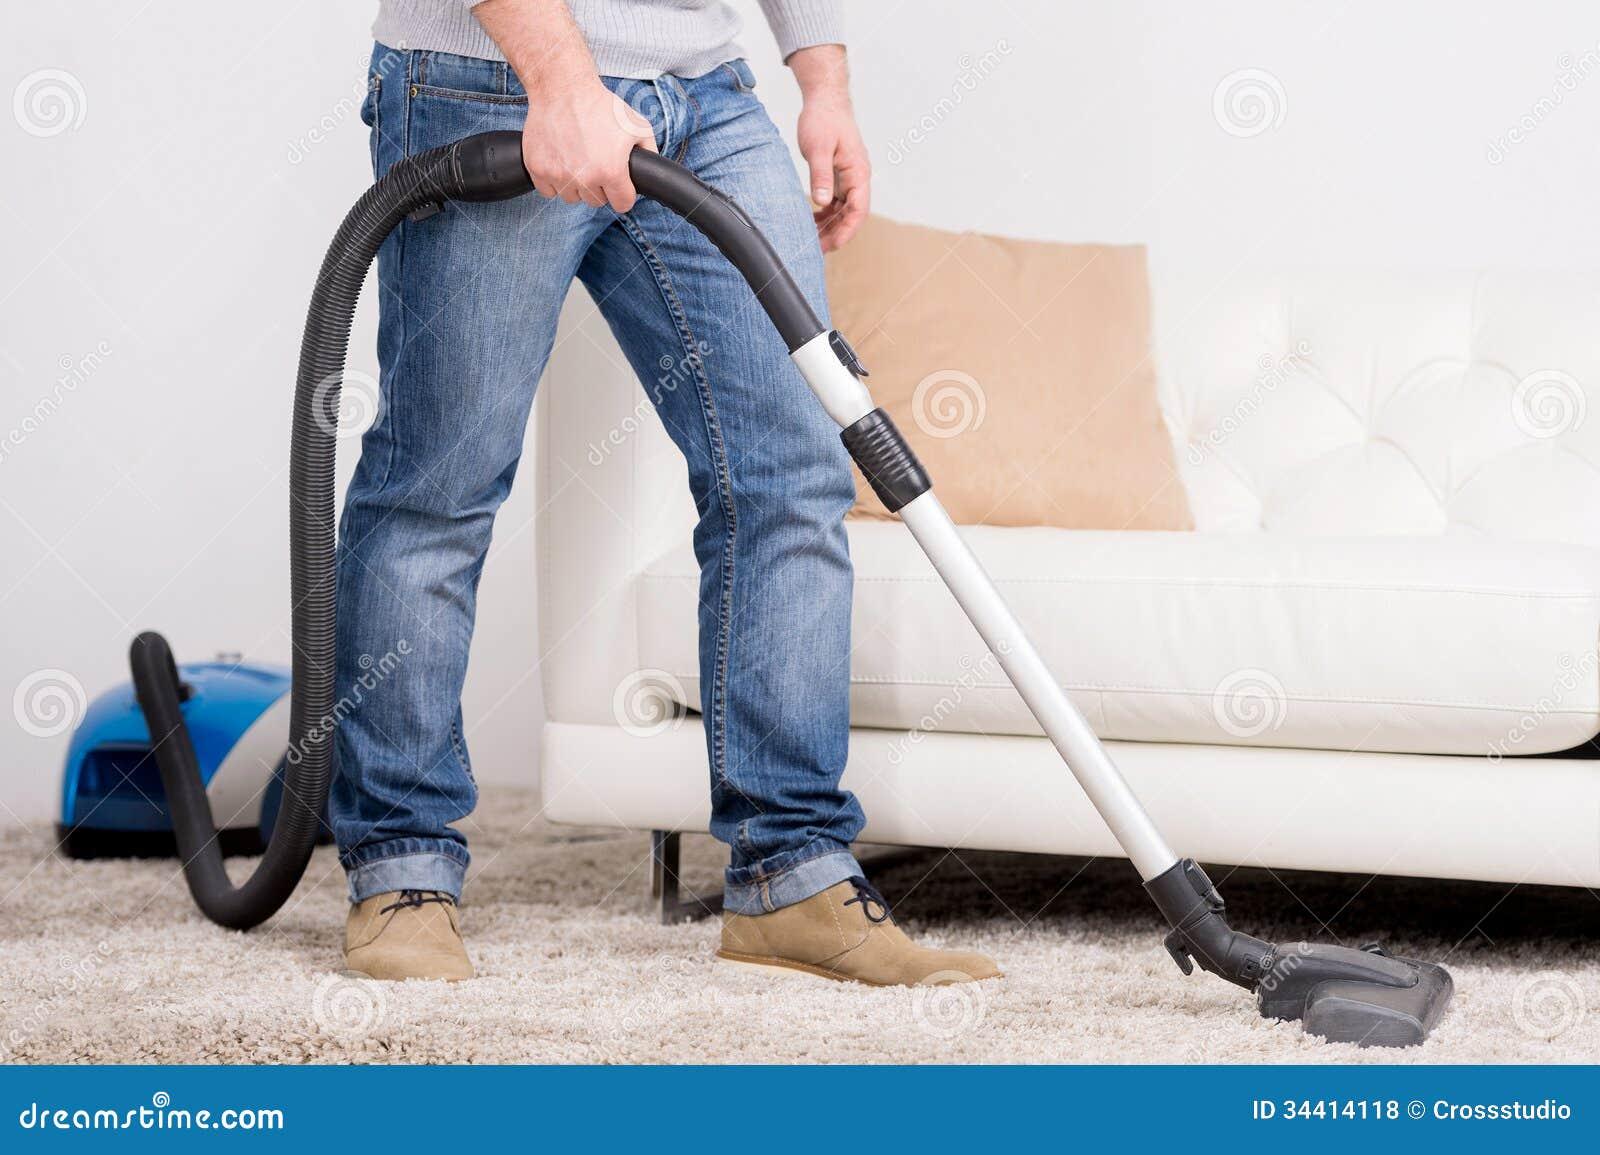 Vacuum Cleaner Royalty-Free Stock Photography | CartoonDealer.com #46099367